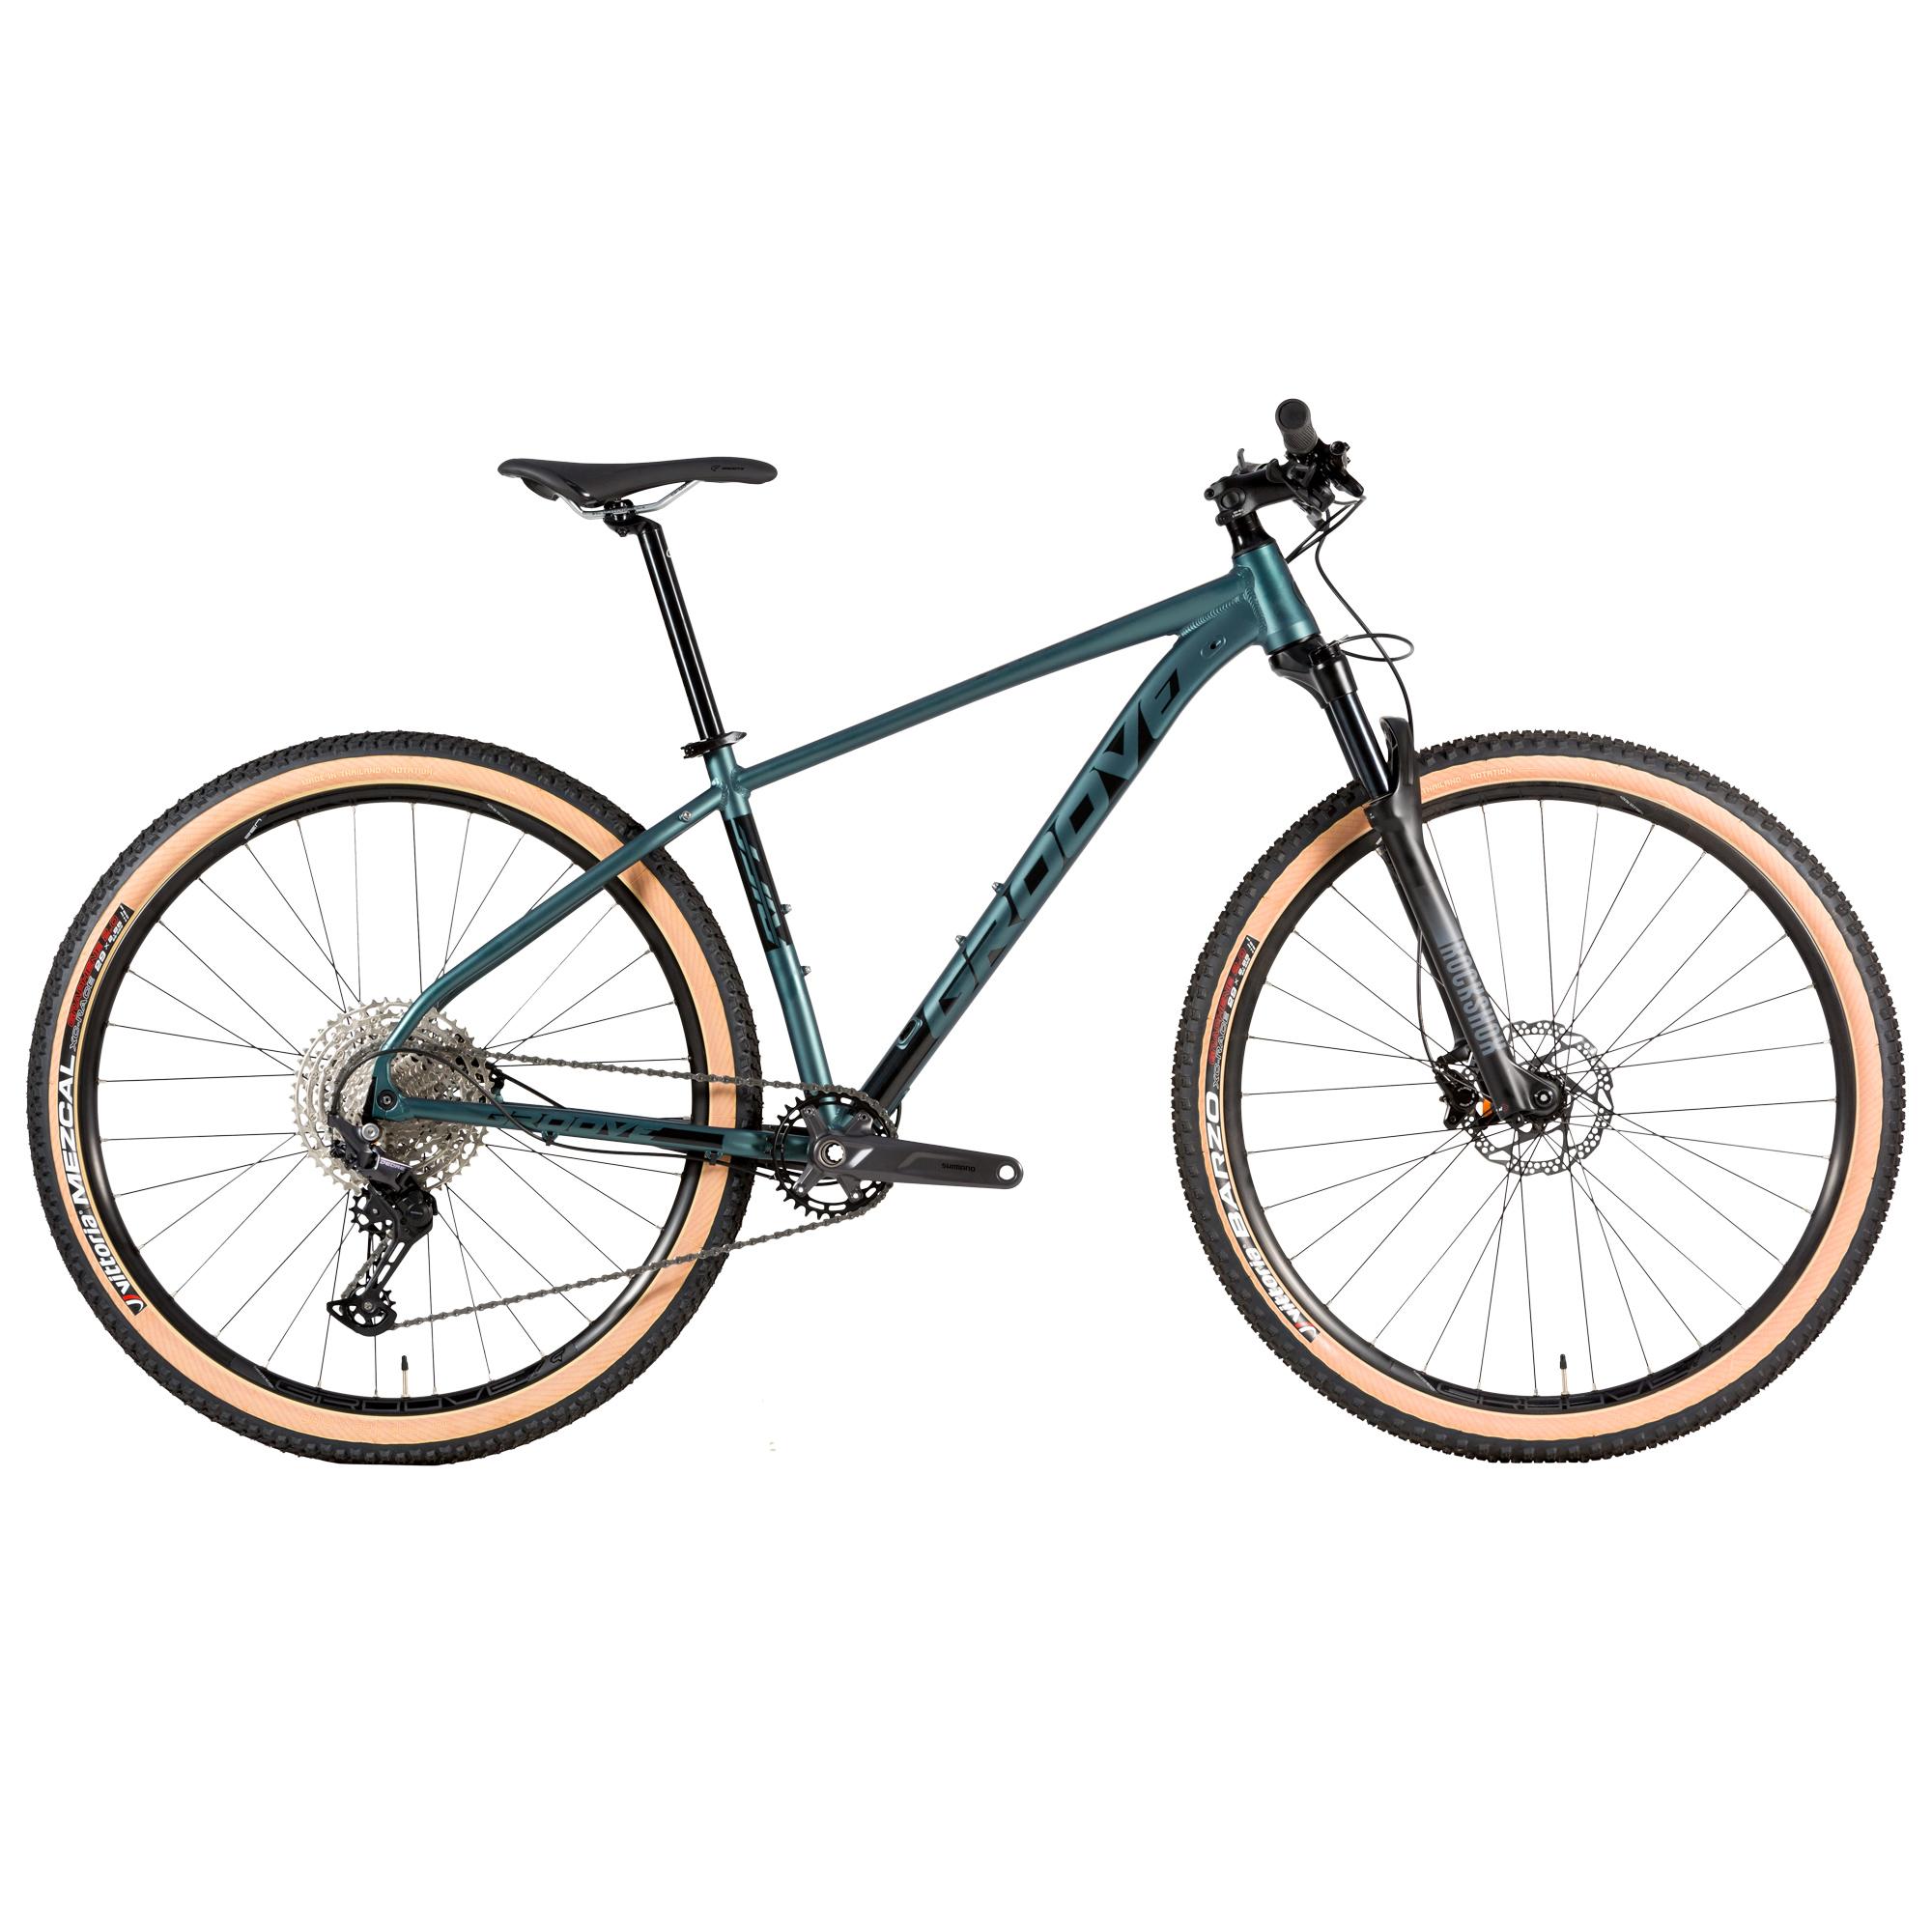 Bicicleta-Groove-RIFF-70-verde-01